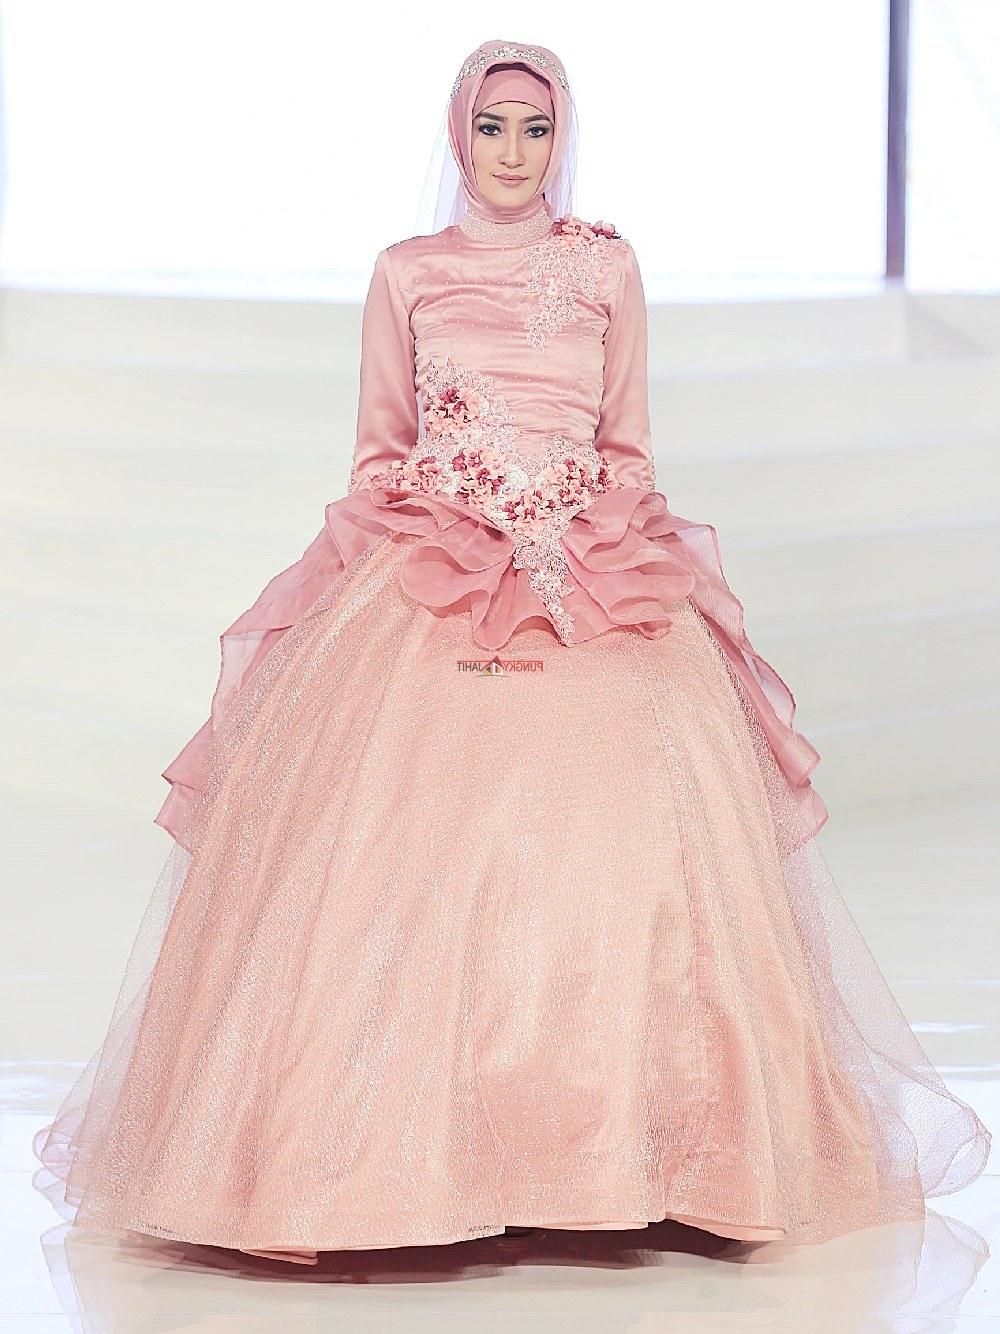 Design Sewa Baju Pengantin Muslimah Murah Fmdf Sewa Perdana Baju Pengantin Muslimah Jogja Gaun Pengantin